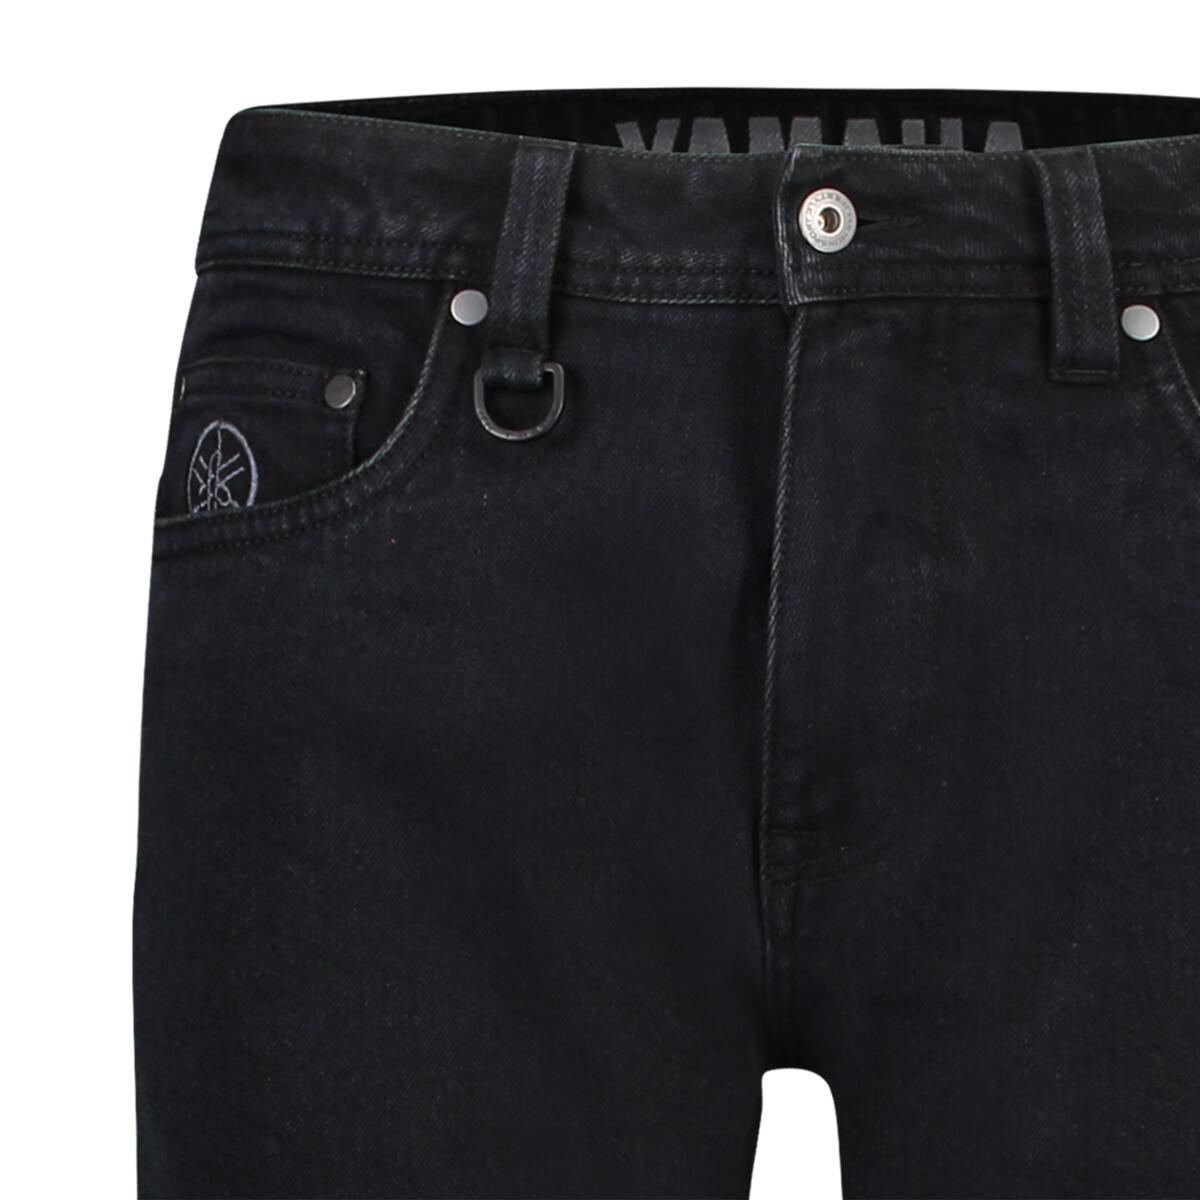 Inquieto Campana Cupon Pantalones Yamaha Blacktranspageants Org